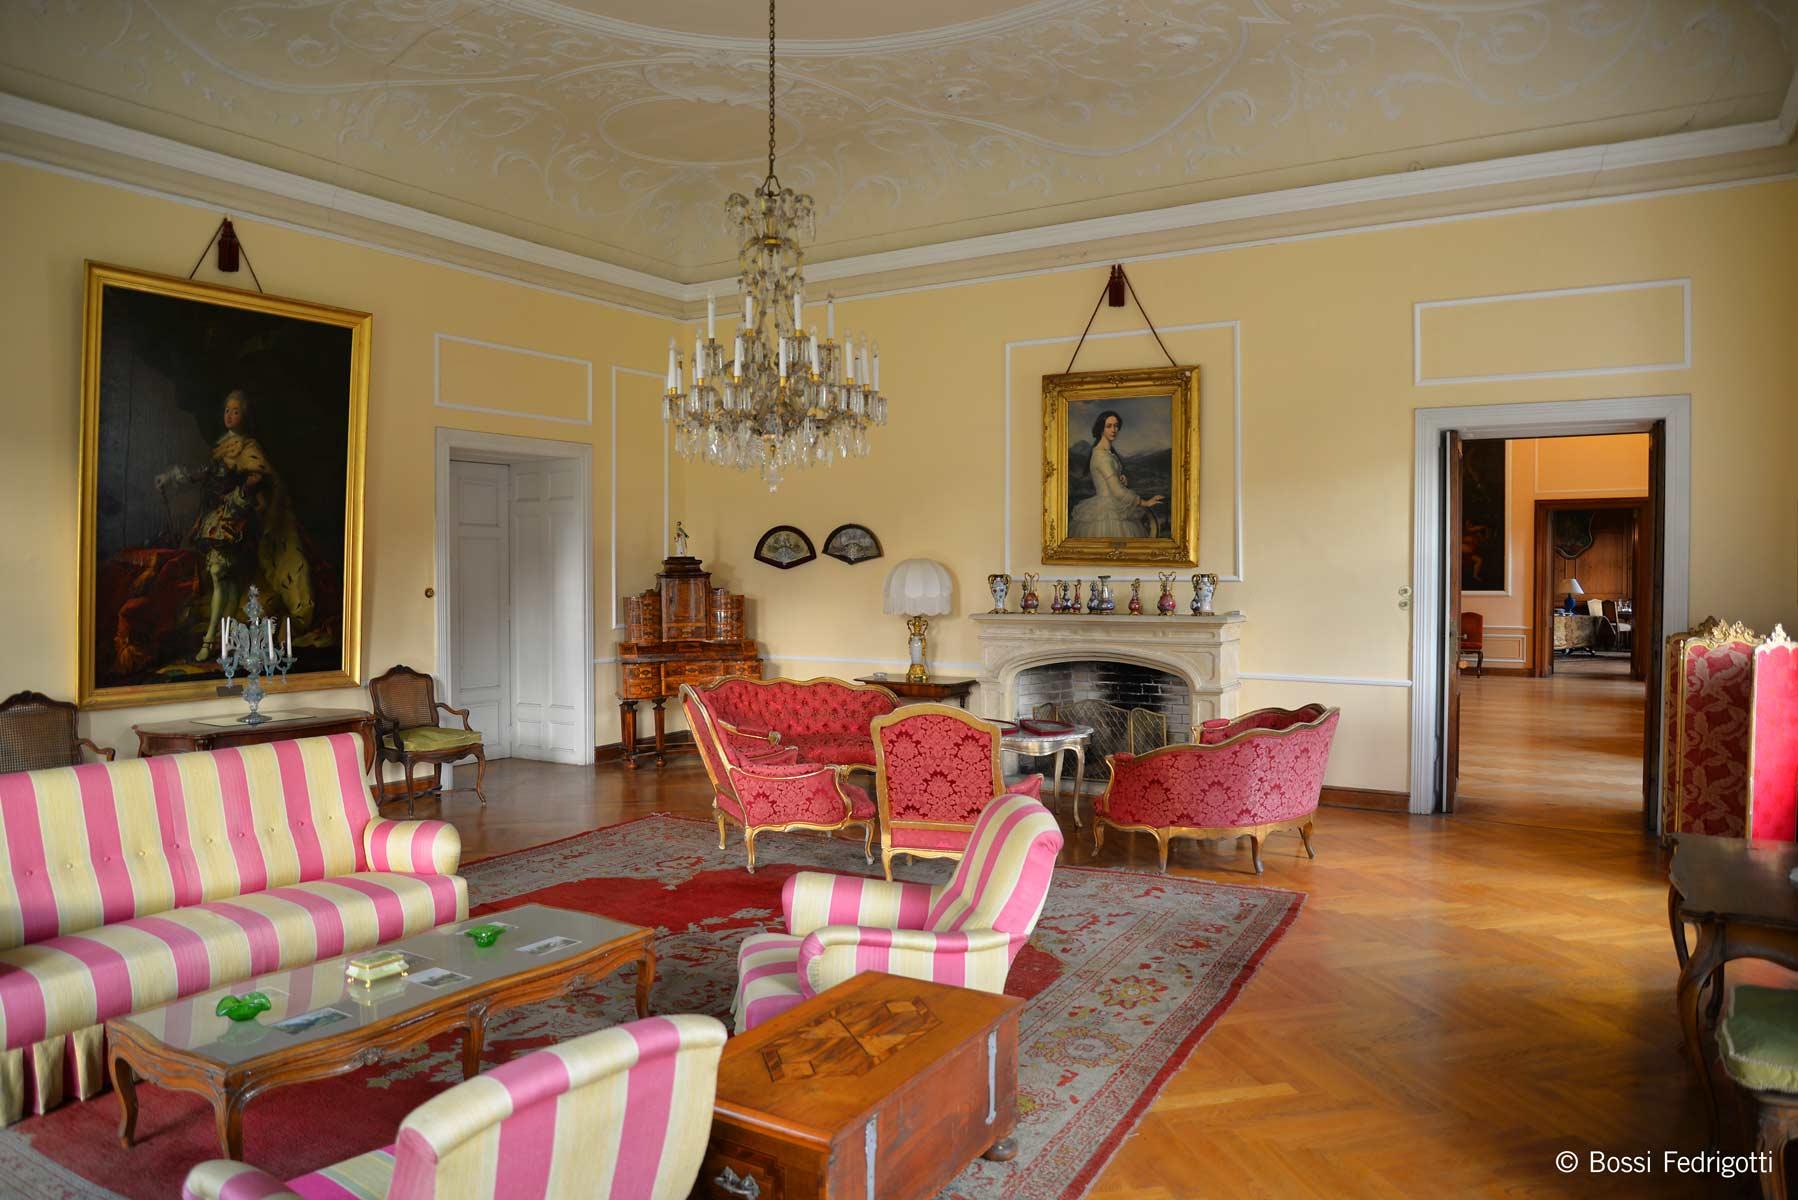 Schloss-Weinern_167_Bossi-Fedrigotti.jpg